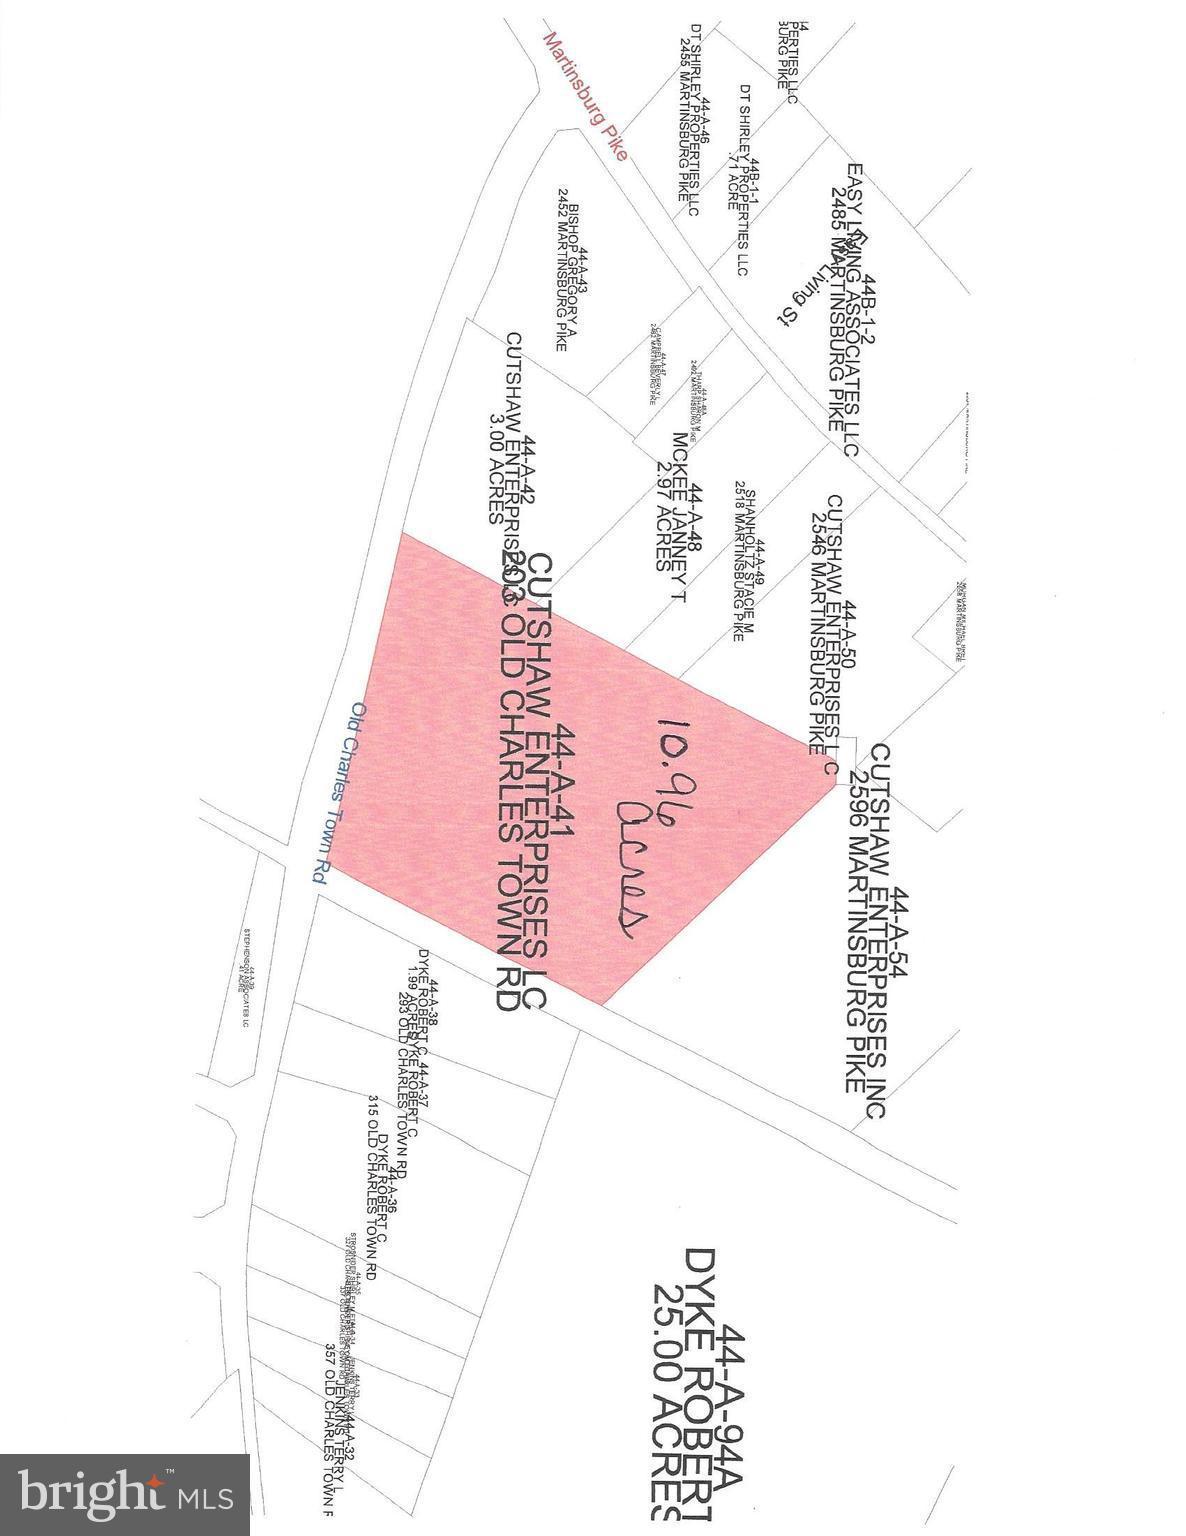 203 OLD CHARLES TOWN ROAD, STEPHENSON, VA 22656